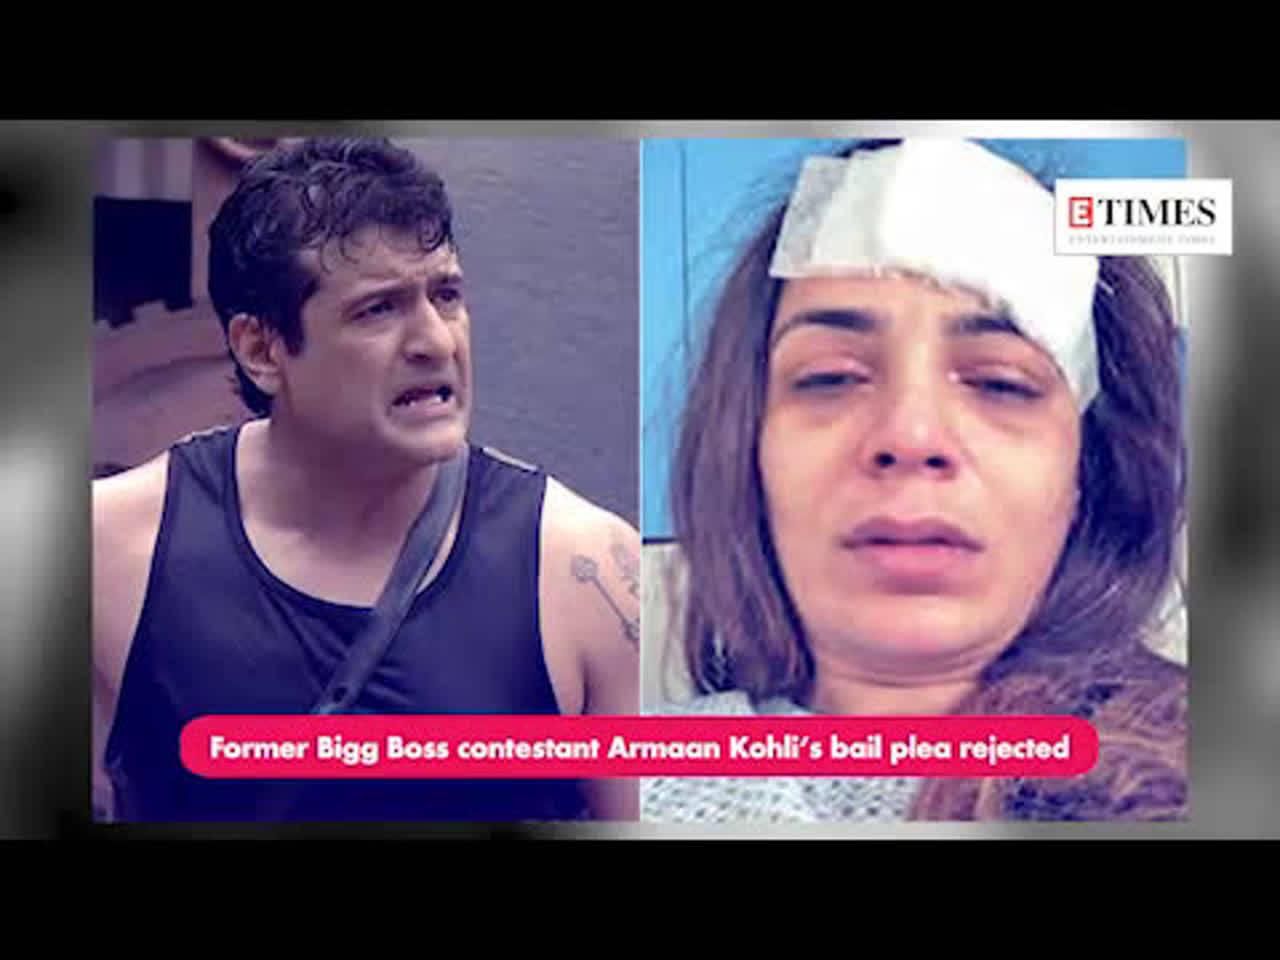 Former Bigg Boss contestant Armaan Kohli's bail plea rejected